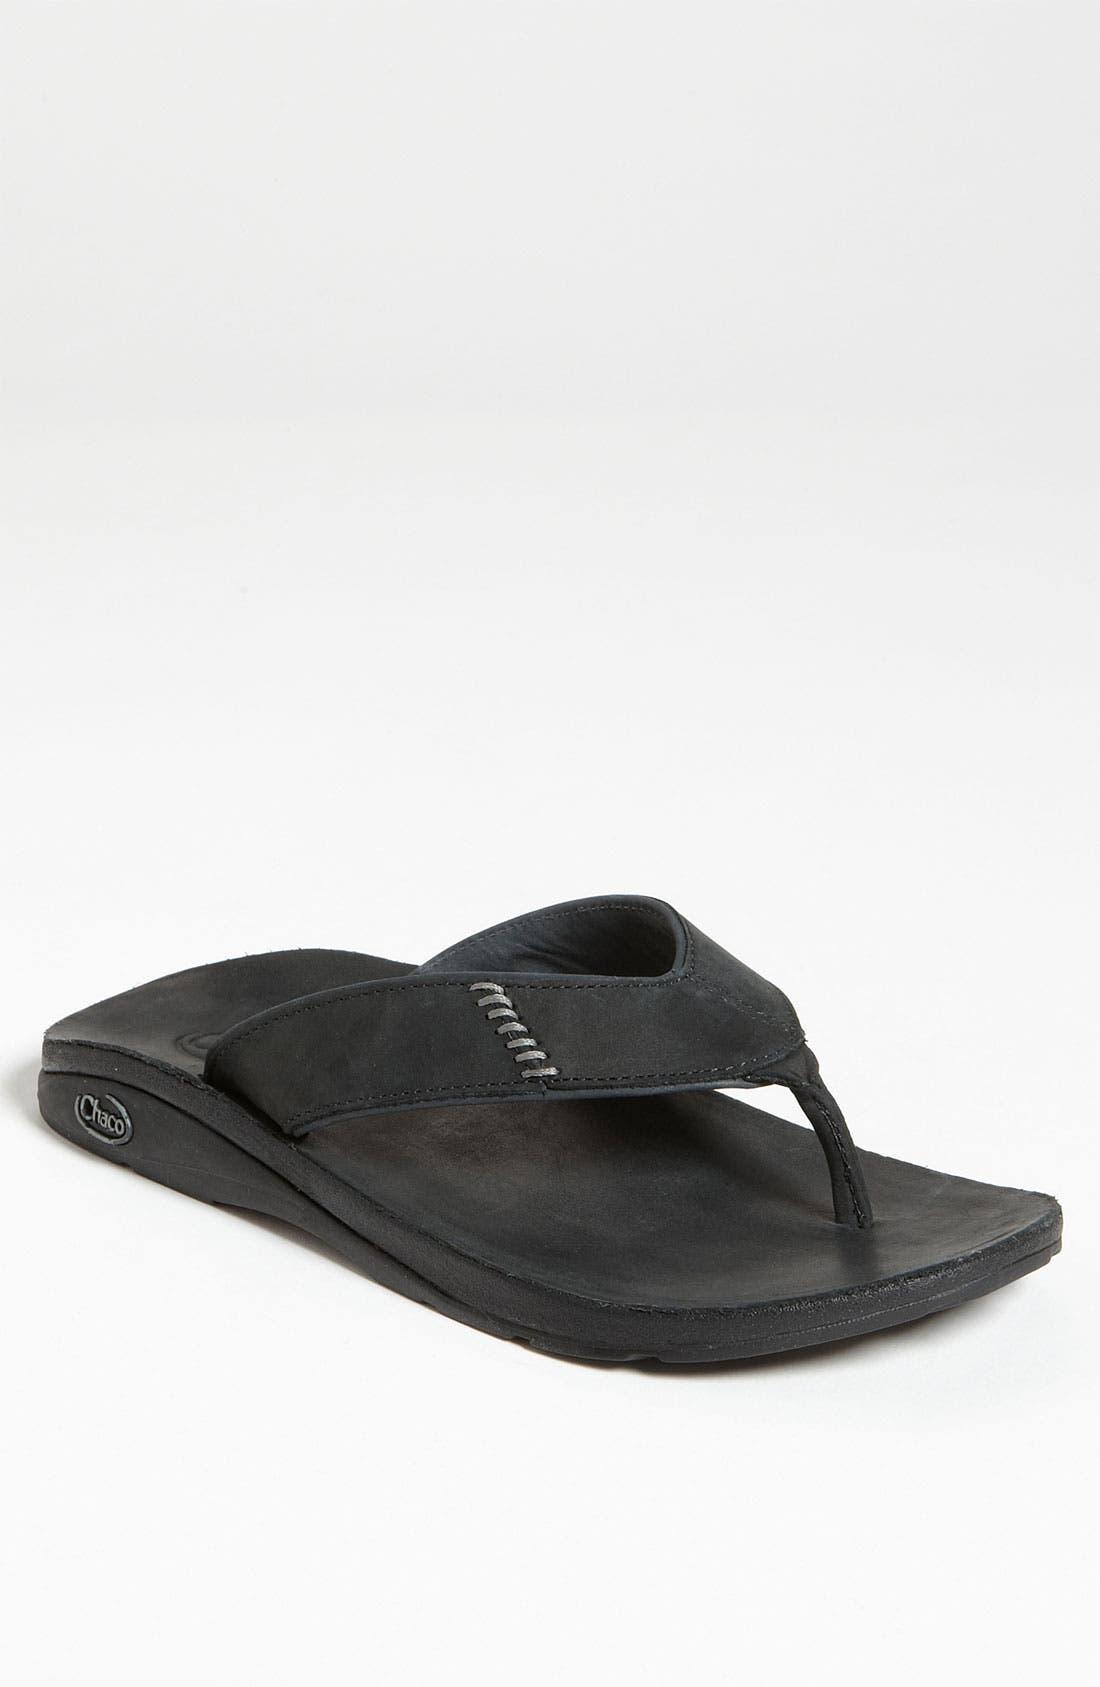 Alternate Image 1 Selected - Chaco 'Cordonazo' Flip Flop